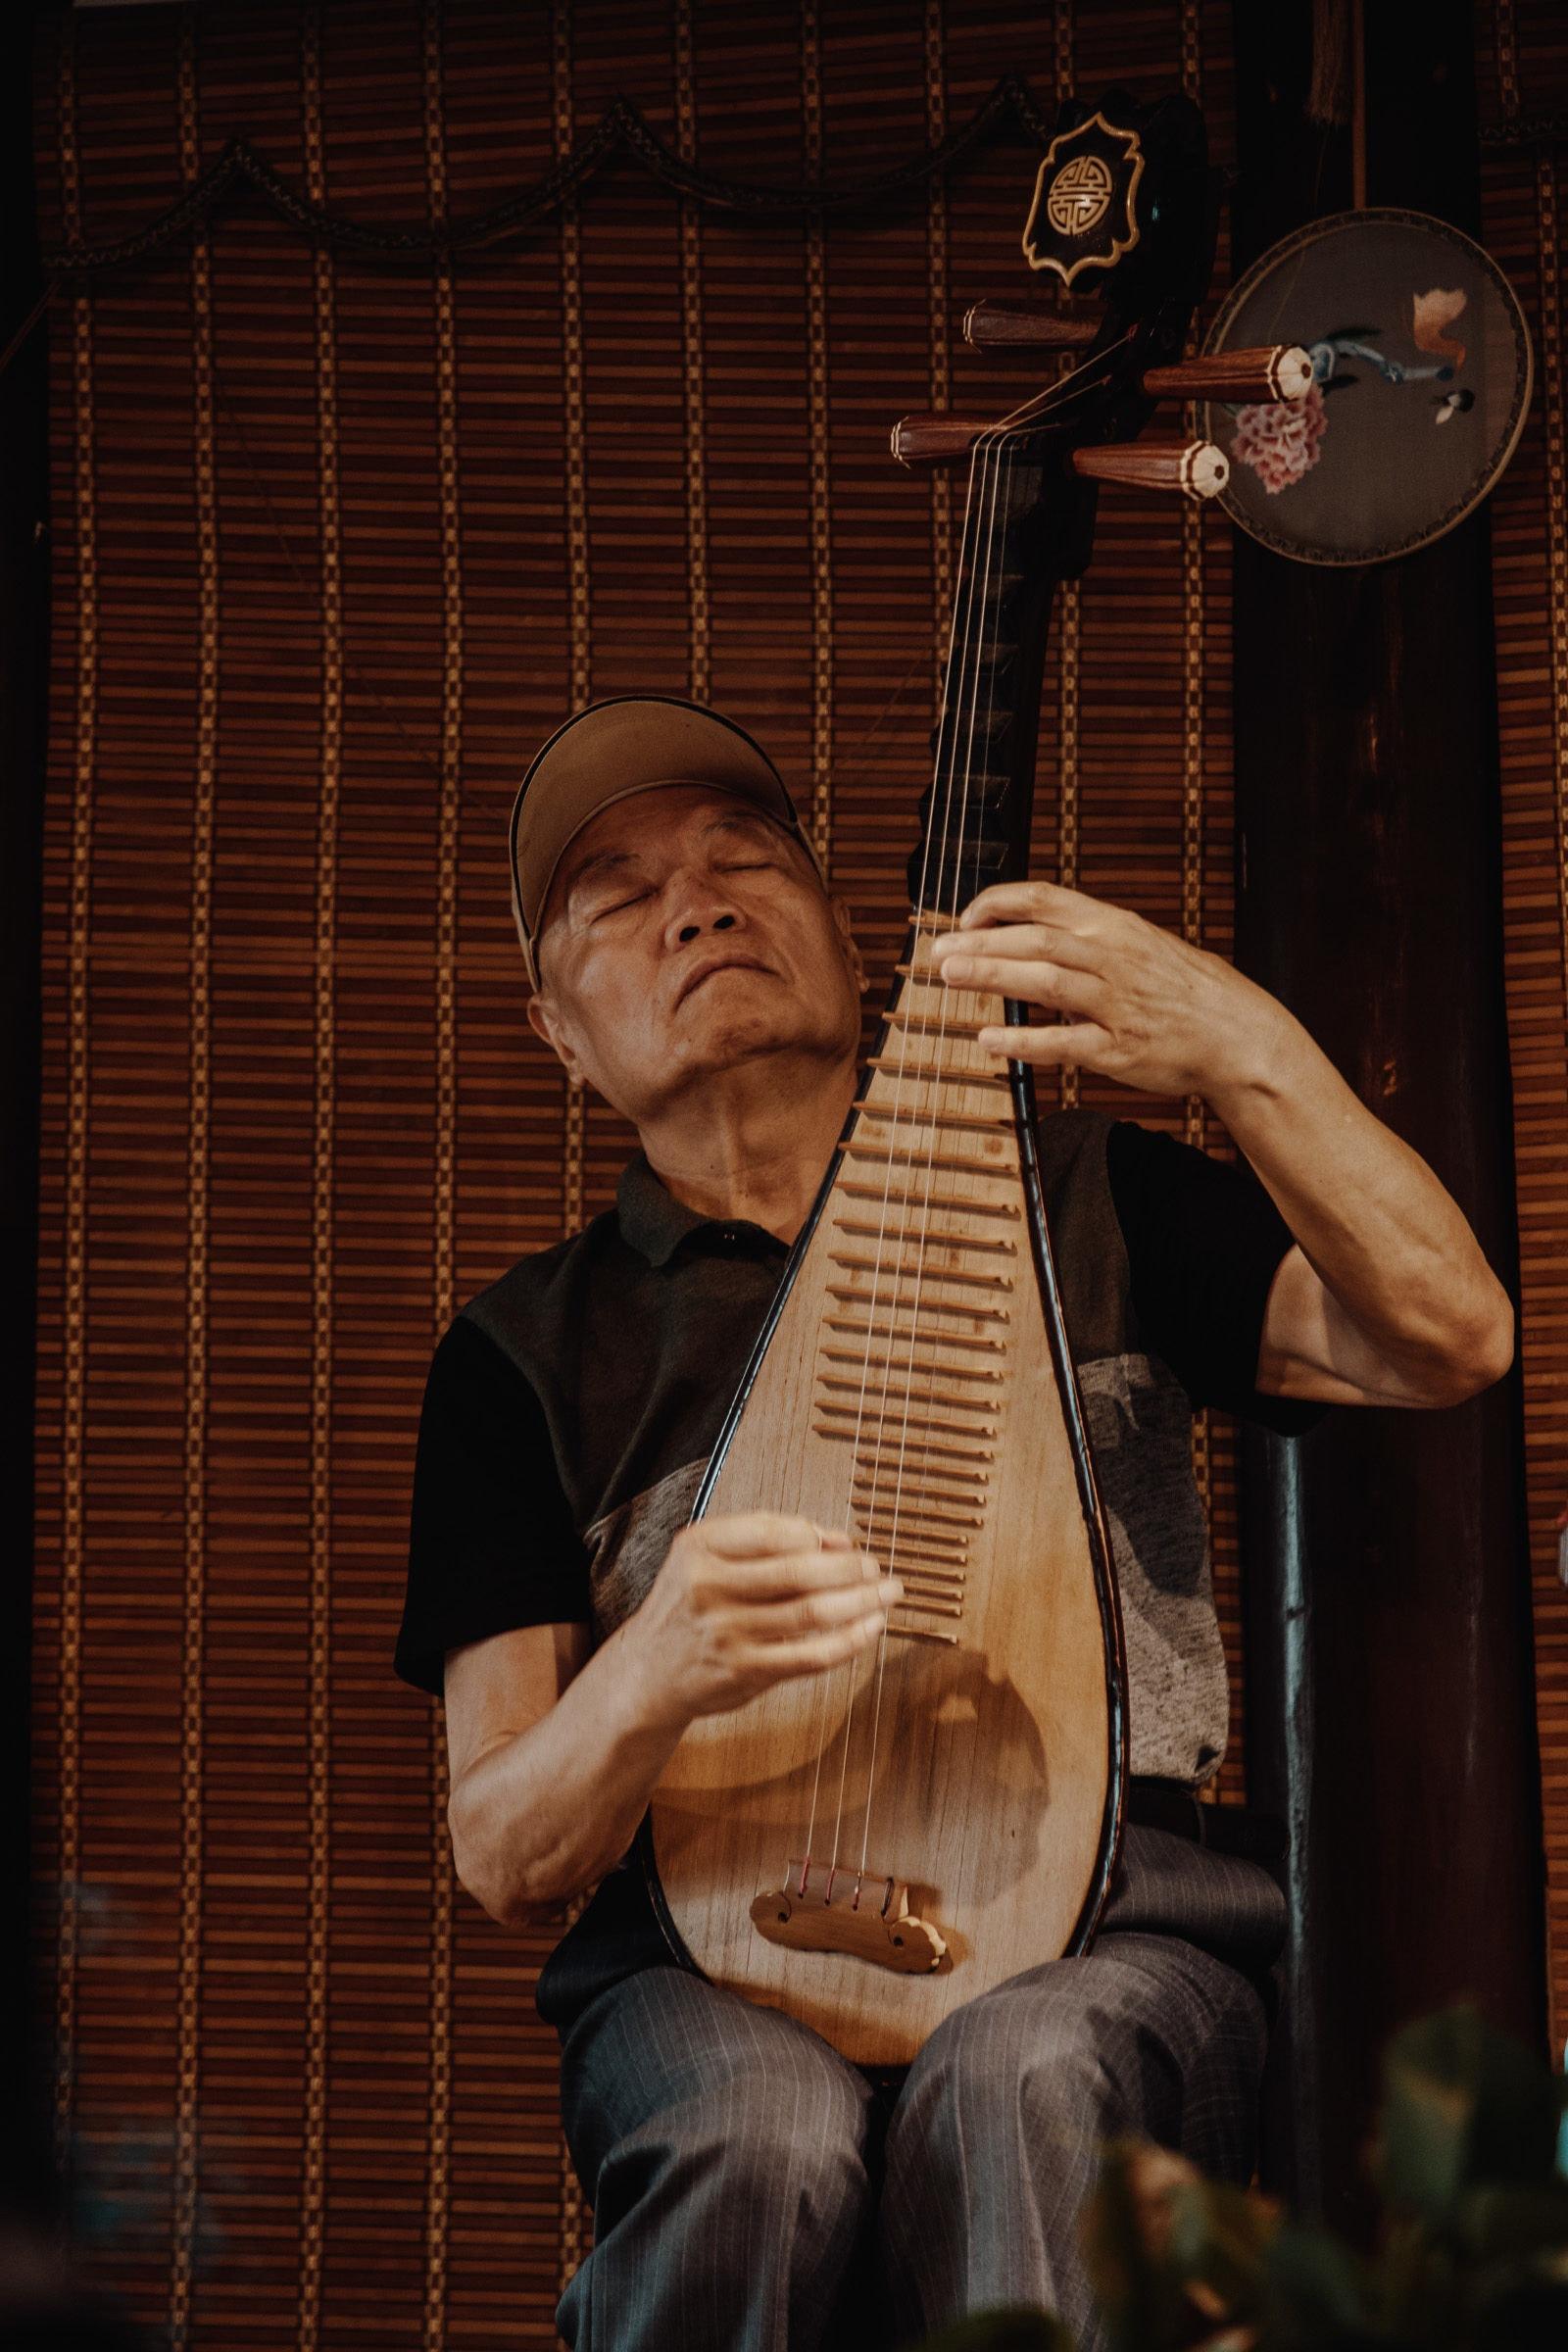 Pingtan Musik im Teehaus Pingjiang Road Suzhou China